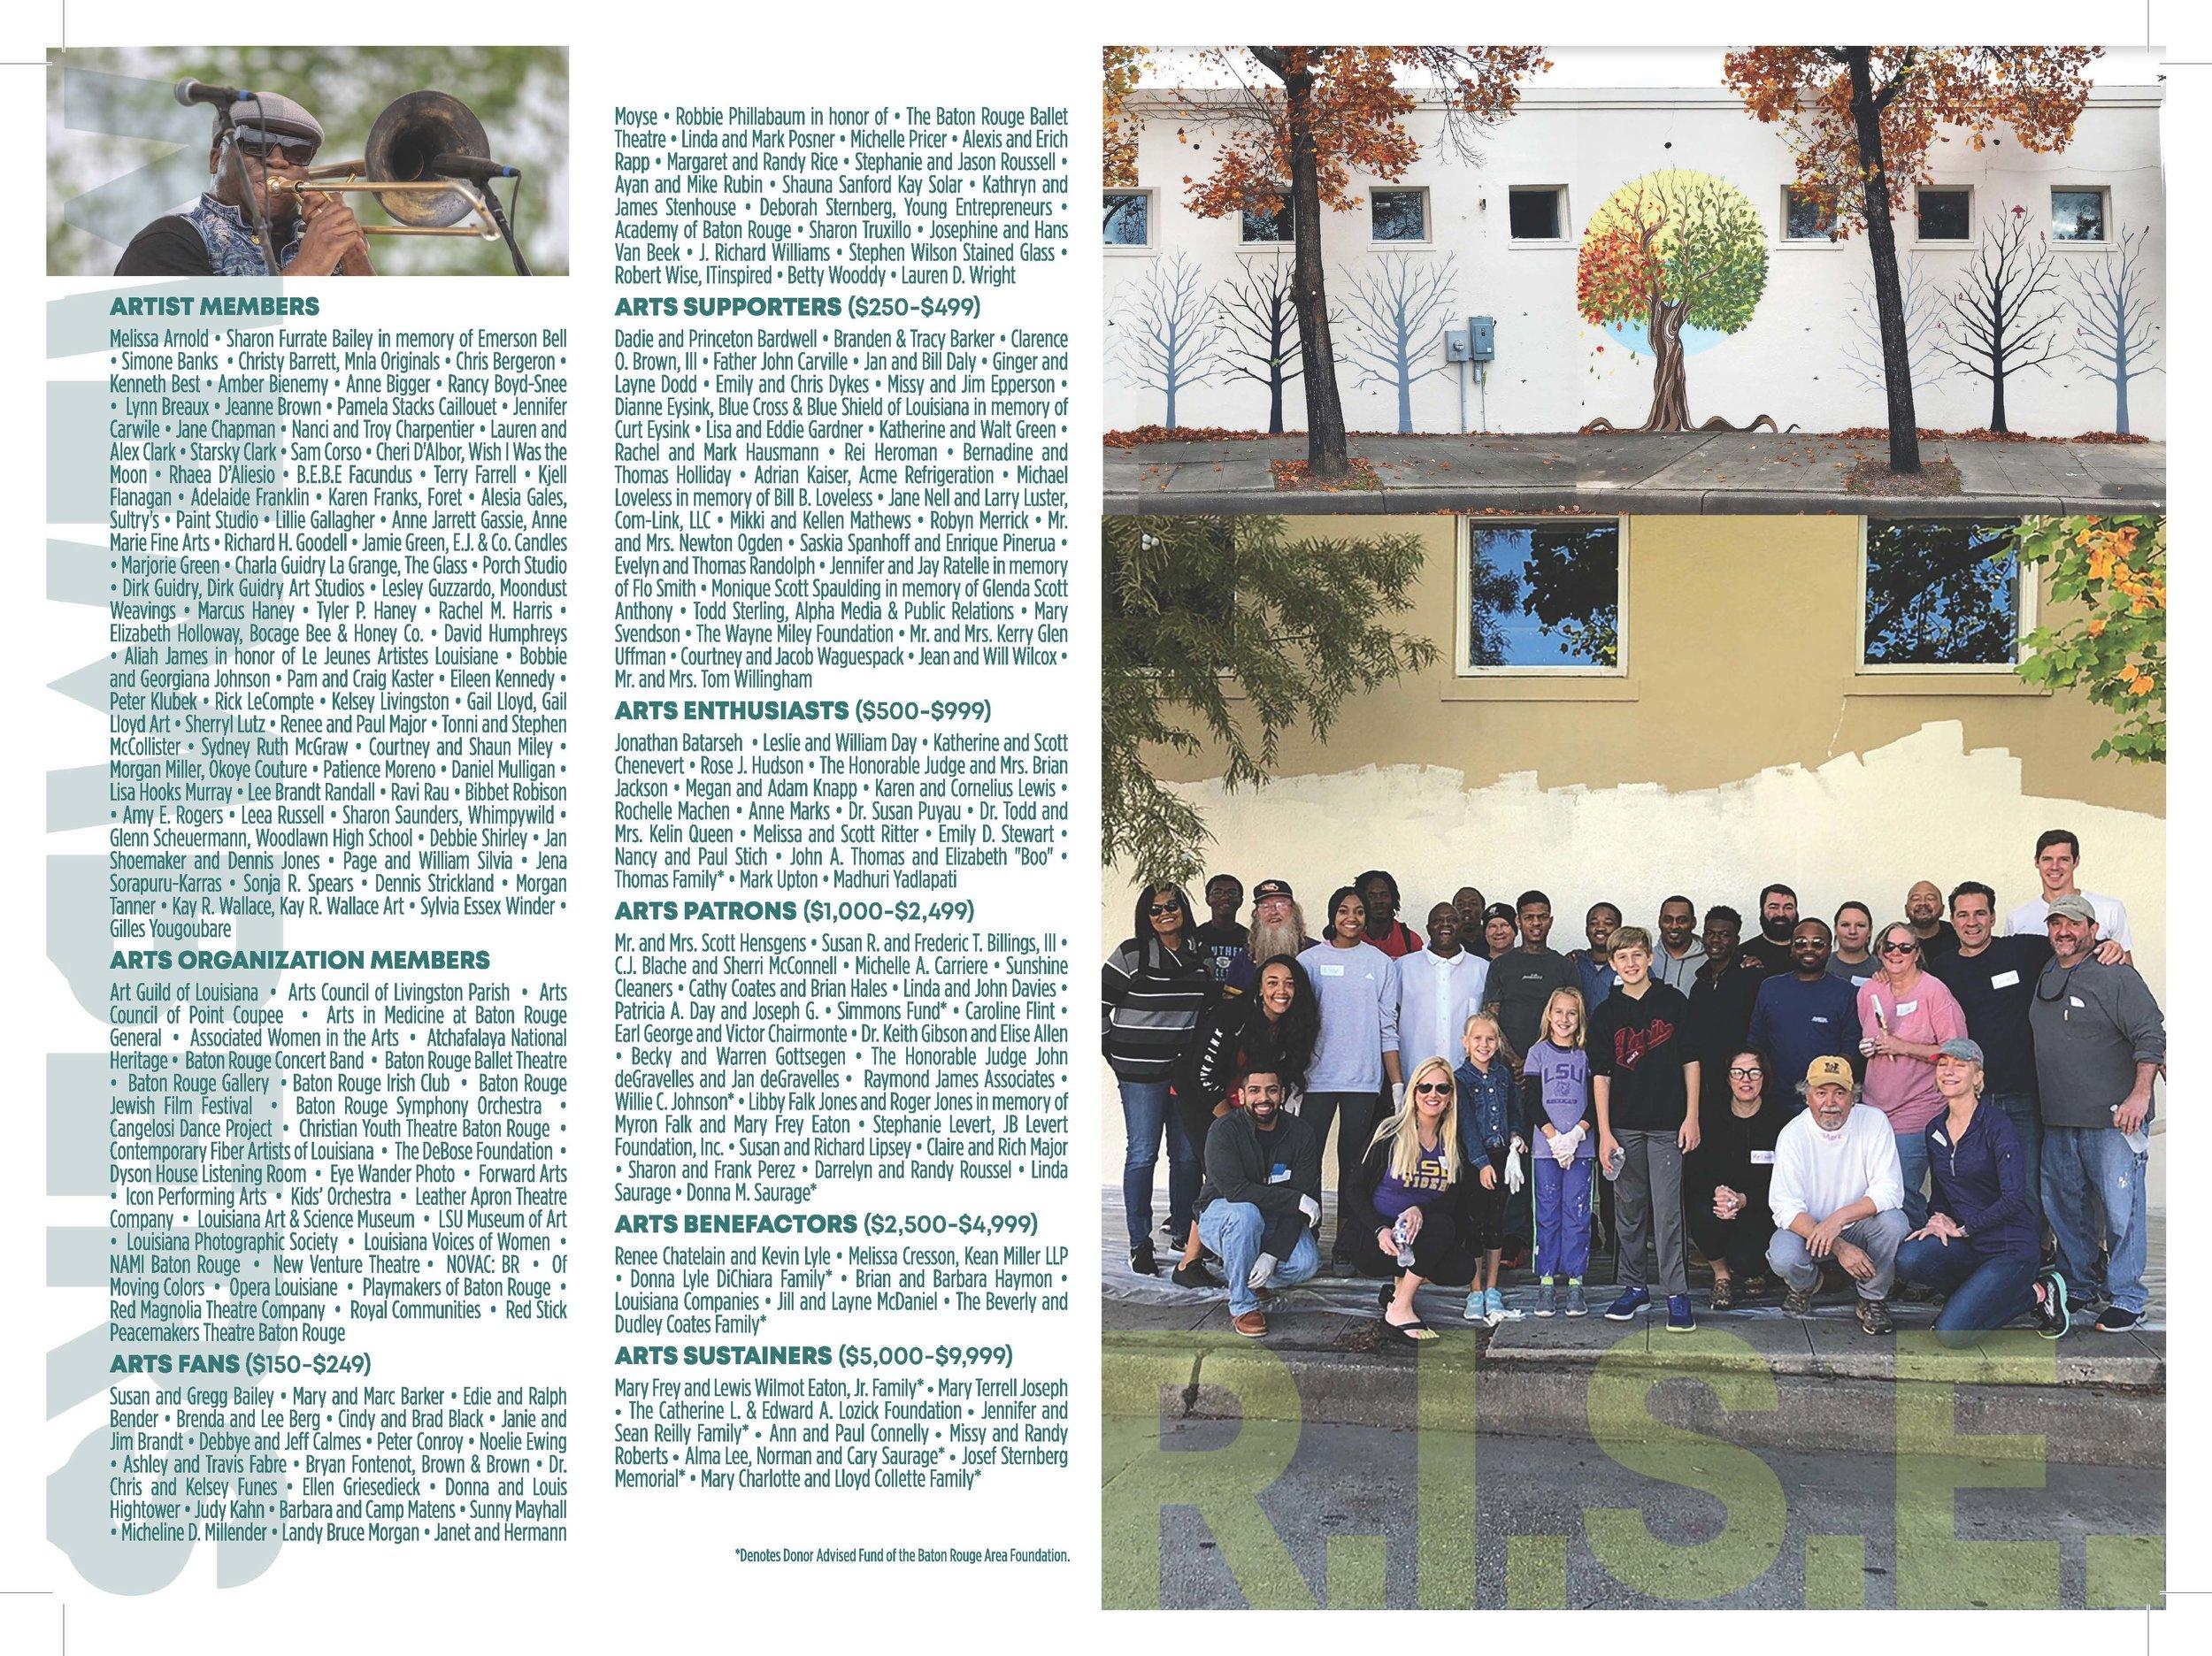 ARTSBR AR 2019 OUTPUT 7-22-19_Page_03.jpg